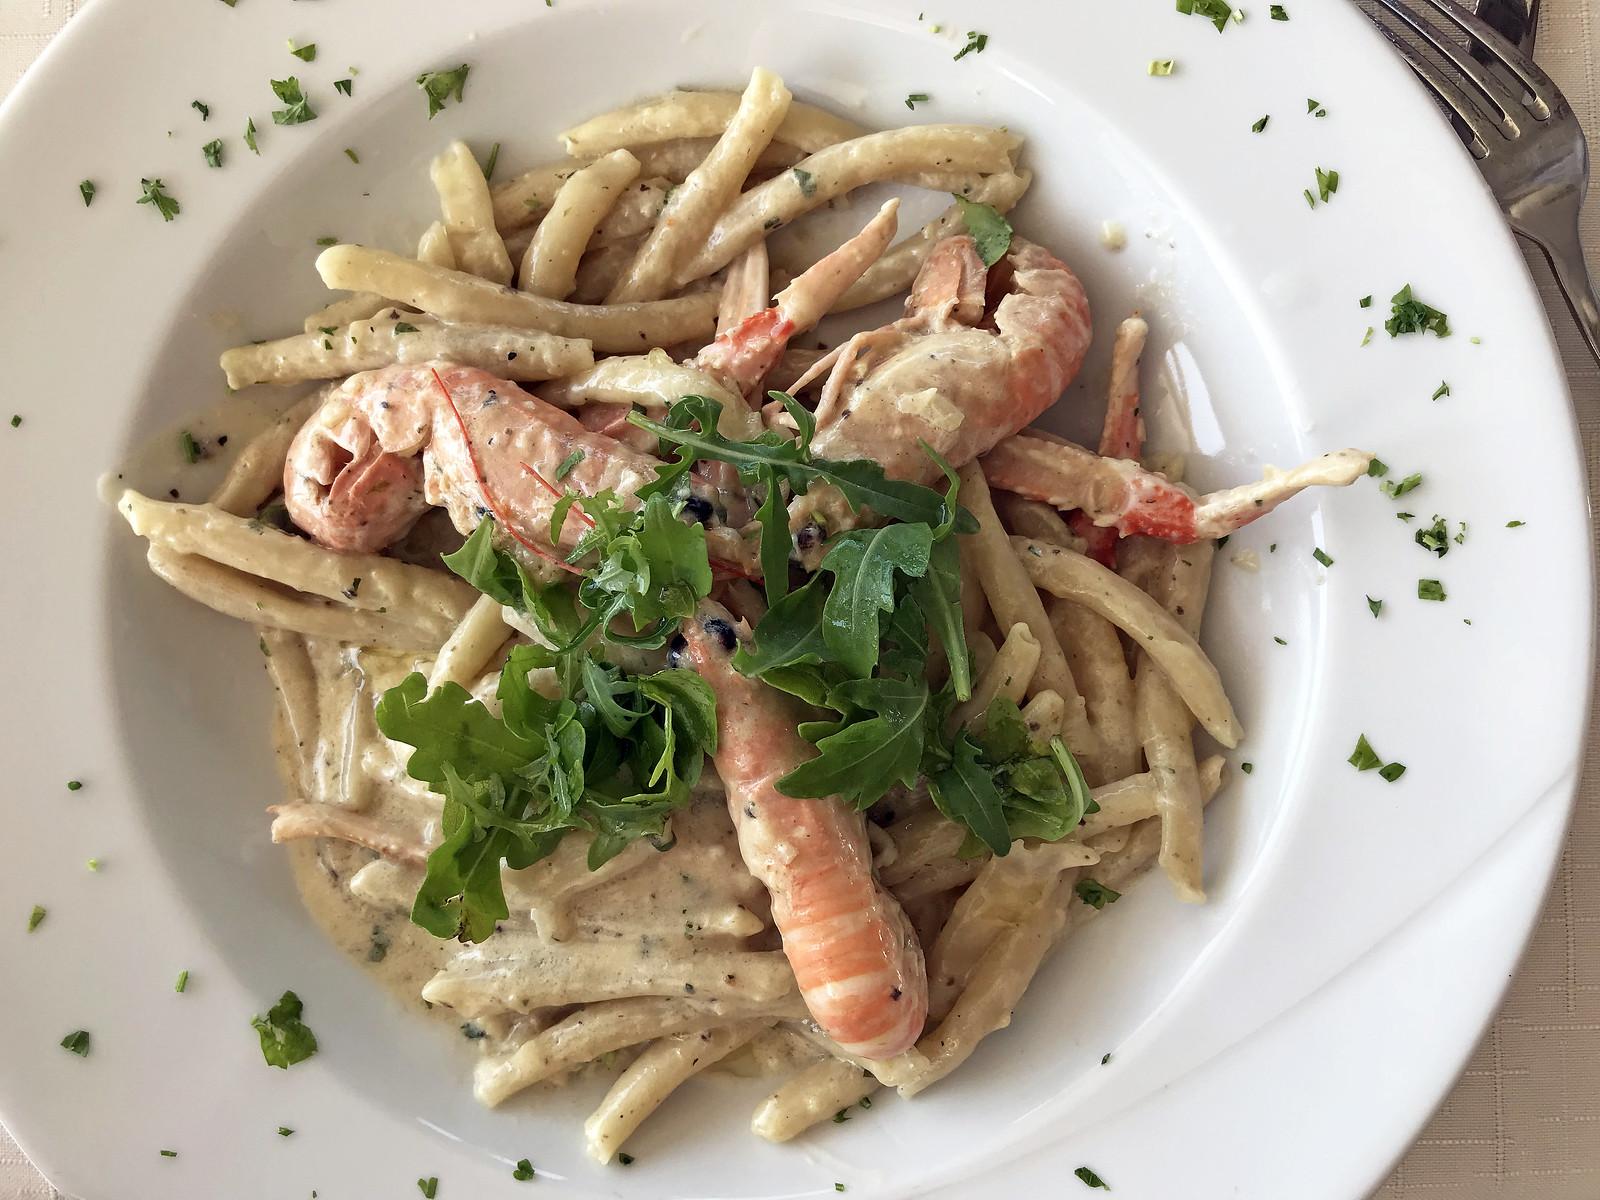 Homemade pasta with shrimp, truffle, and arugula at Lungomare Restaurant